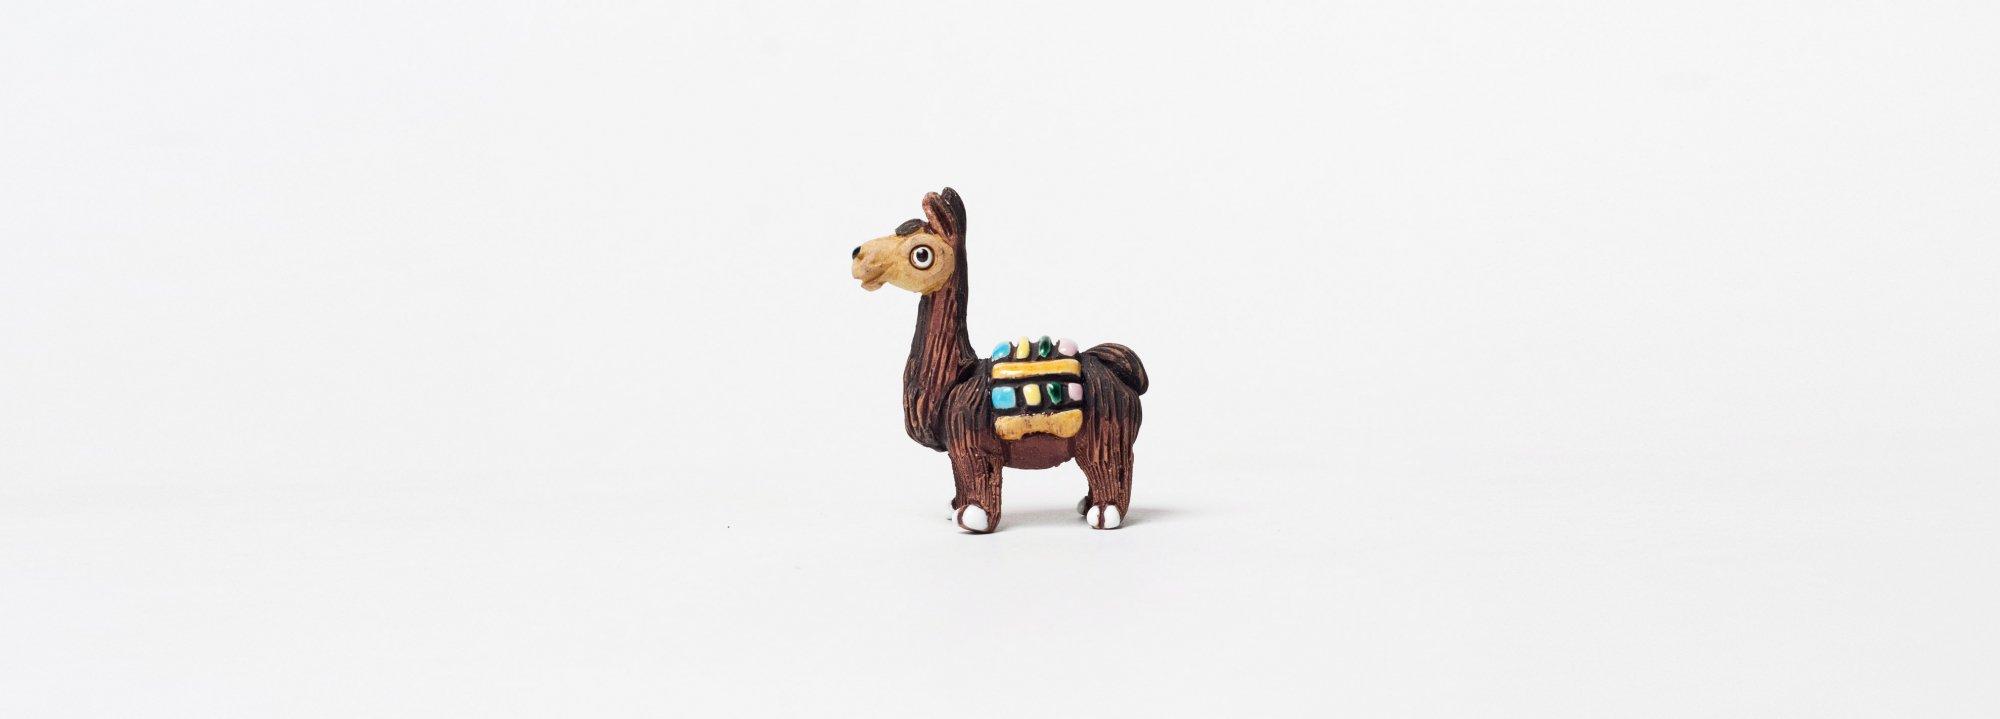 Vintage Object : Peruvian Llama